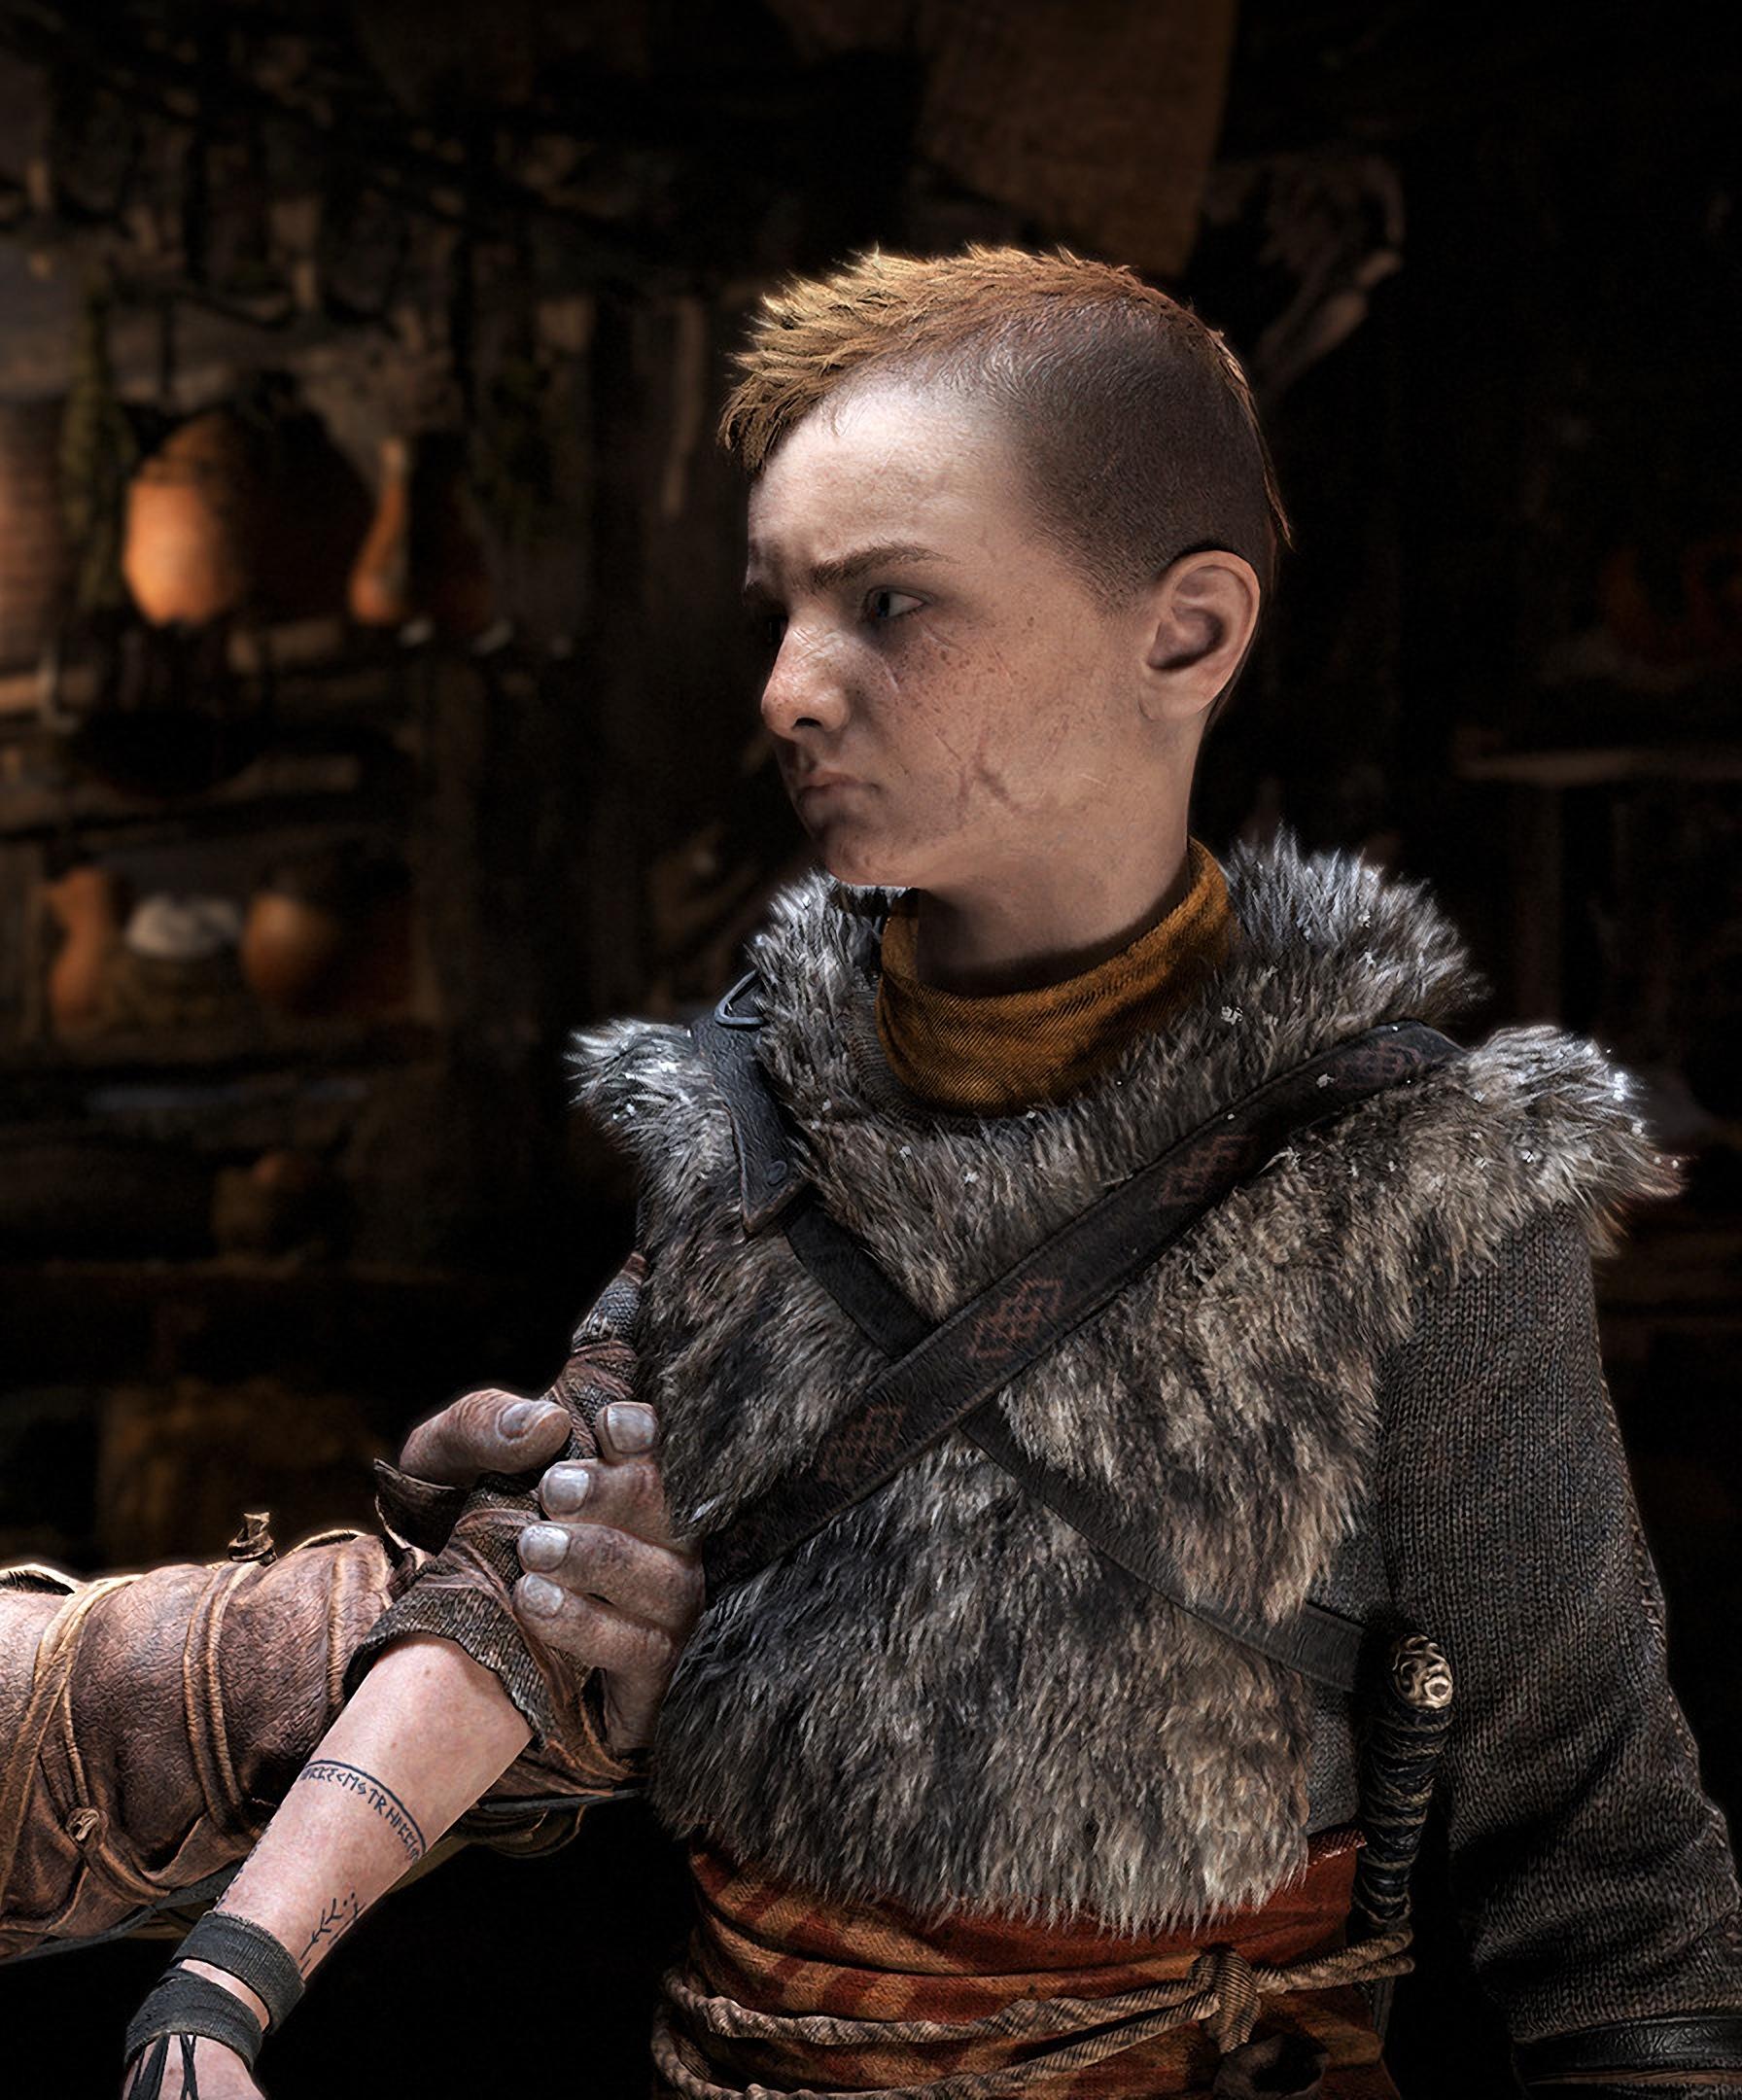 kratos-and-atreus-god-of-war-ps4-2018-z432-resized.jpg